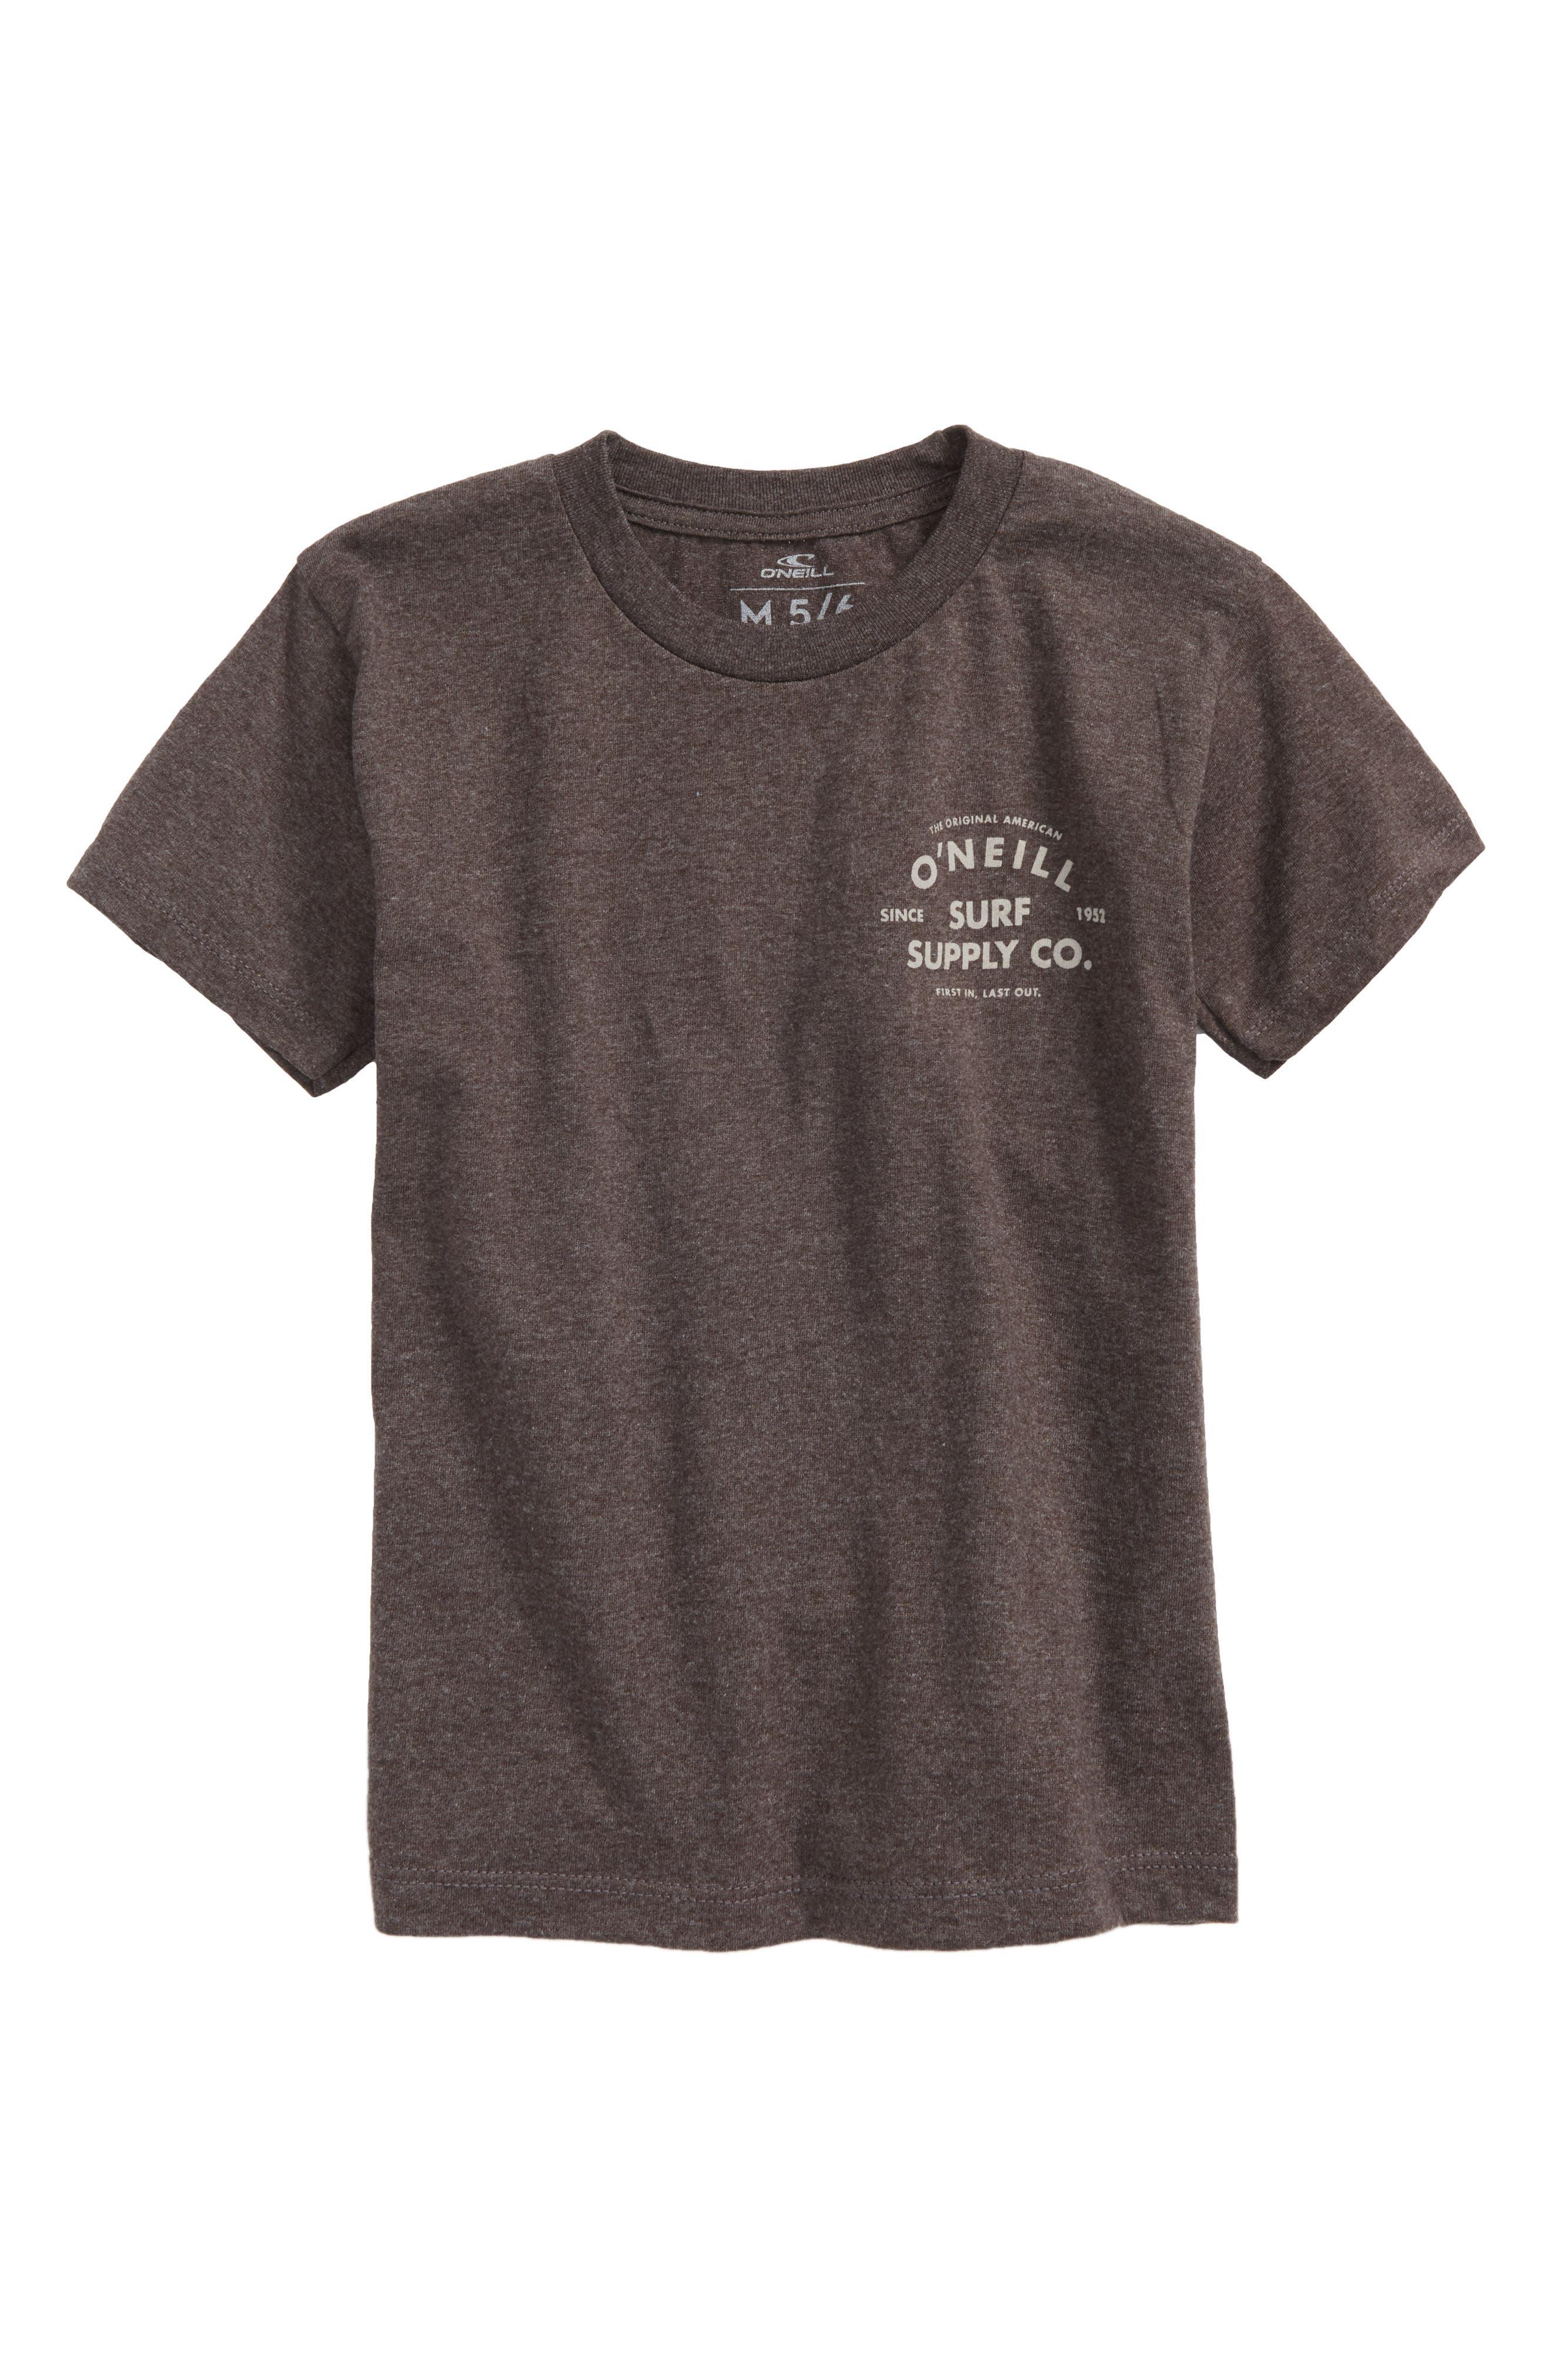 Gonner Graphic T-Shirt,                             Main thumbnail 1, color,                             Heather Black